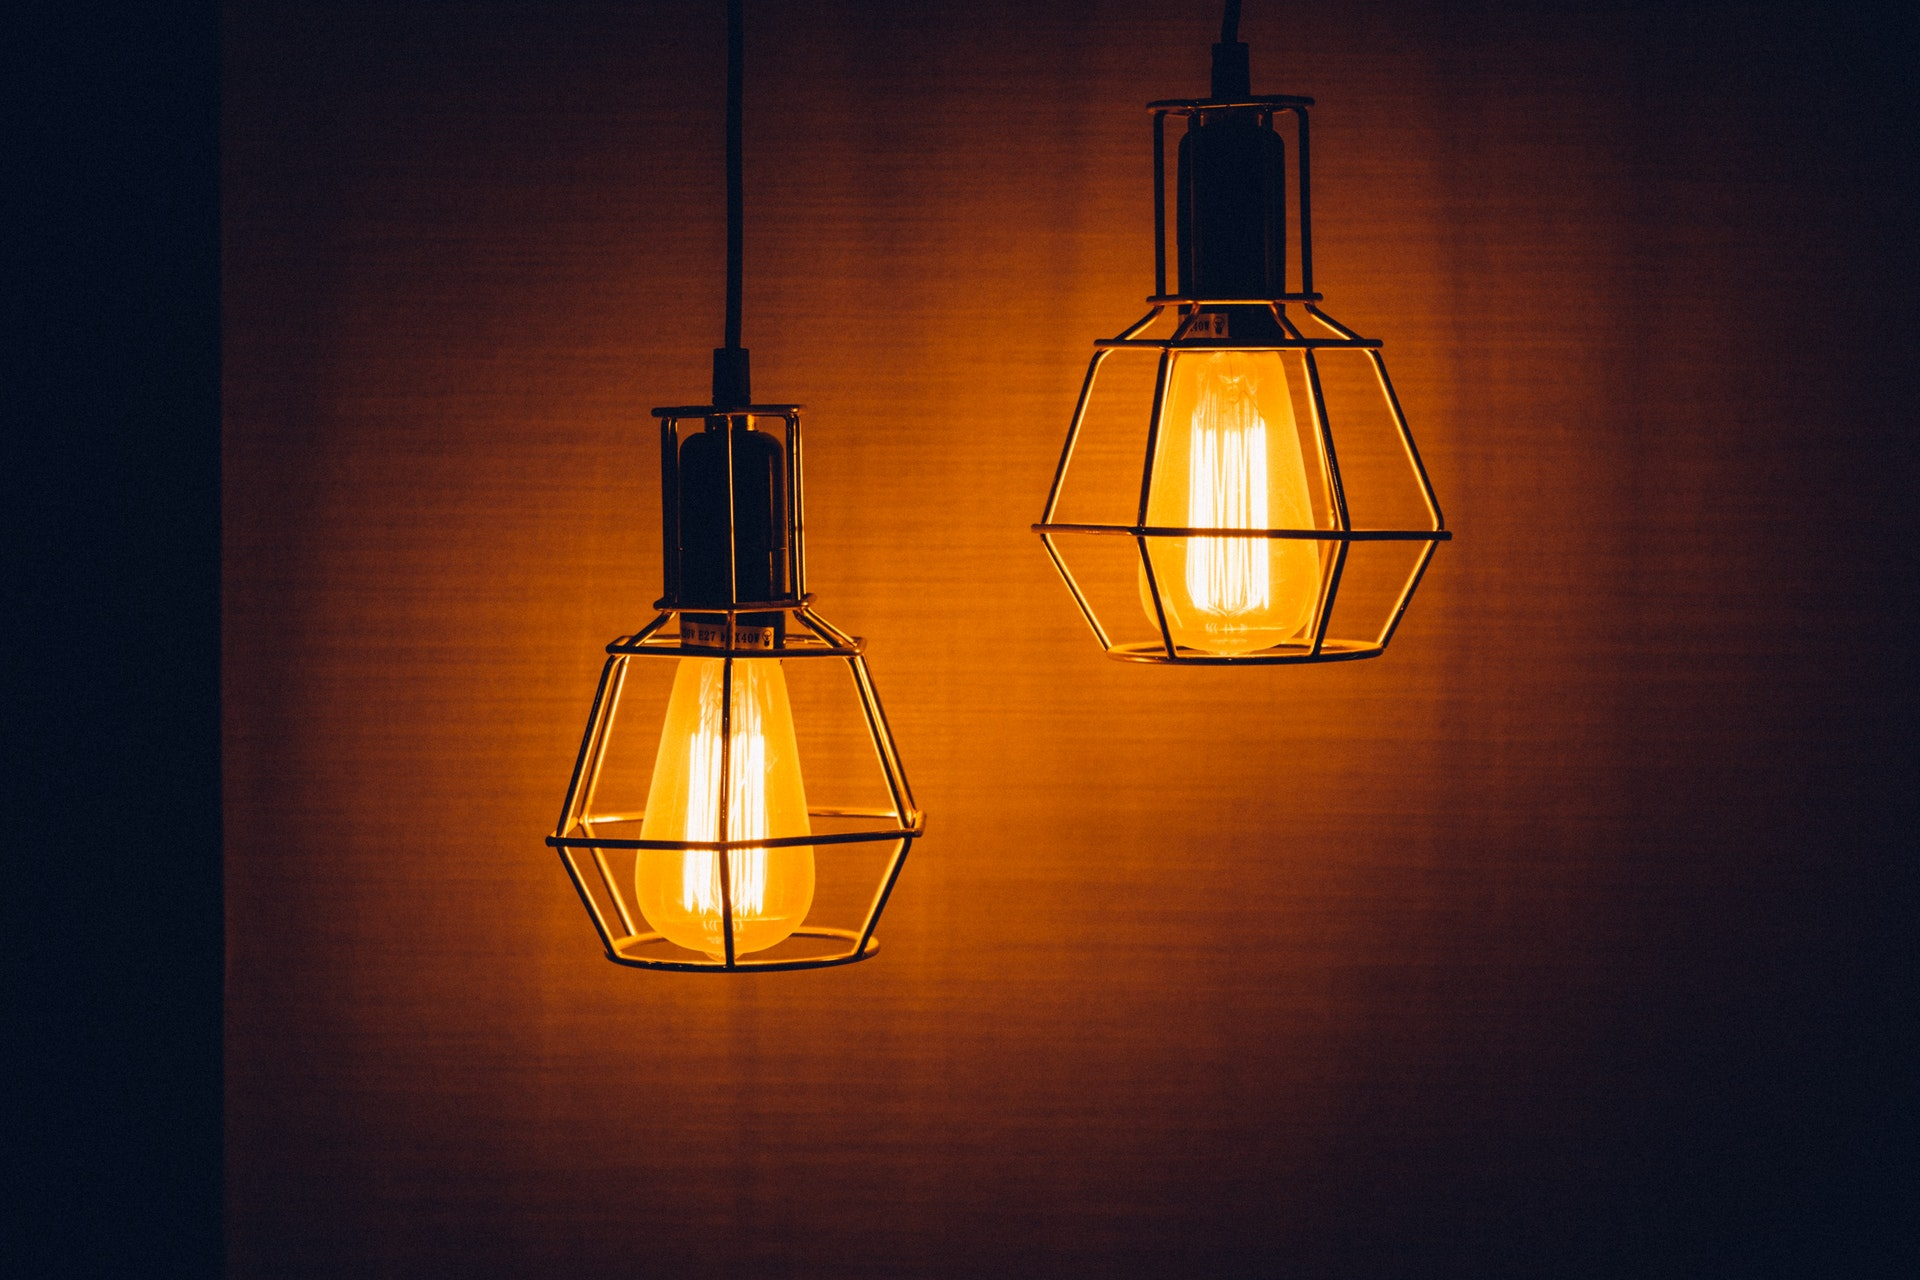 Brighten Your Life With Deck Lighting